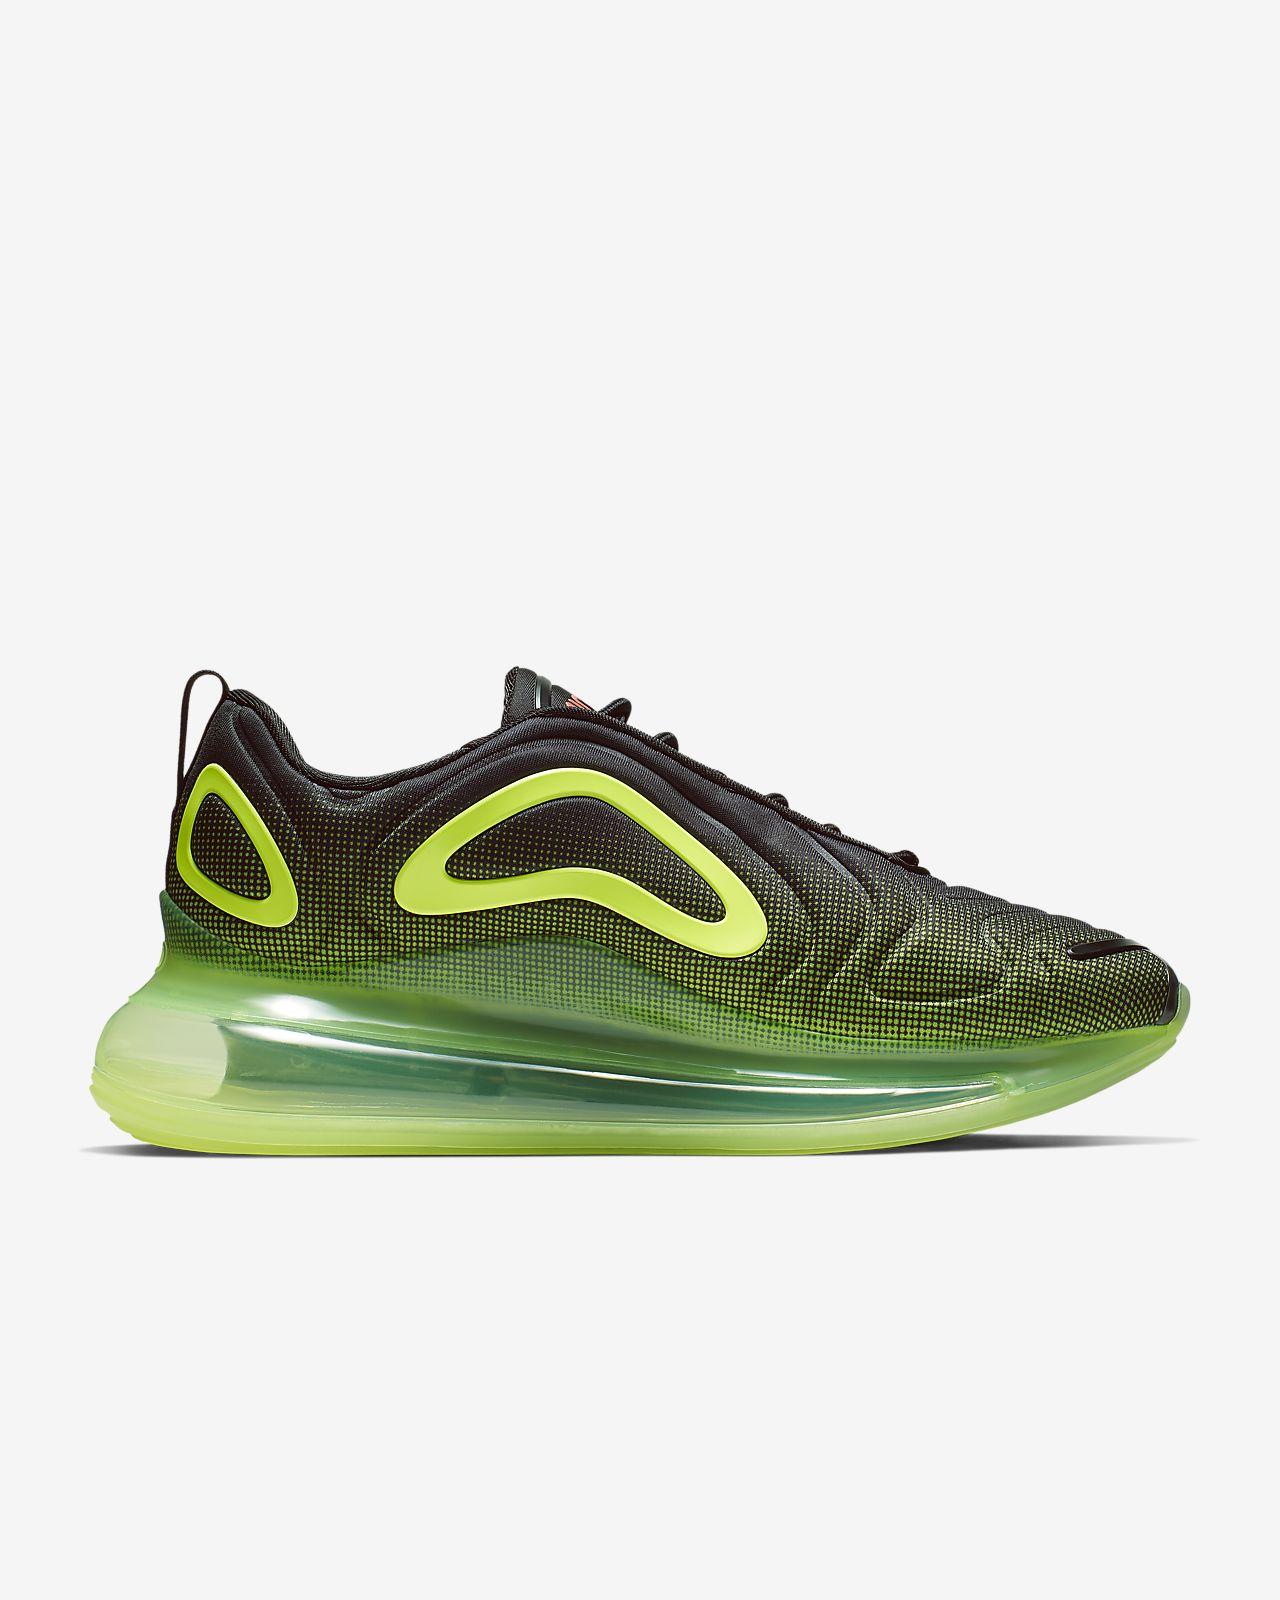 8380d288183364 Chaussure Nike Air Max 720 pour Homme. Nike.com FR